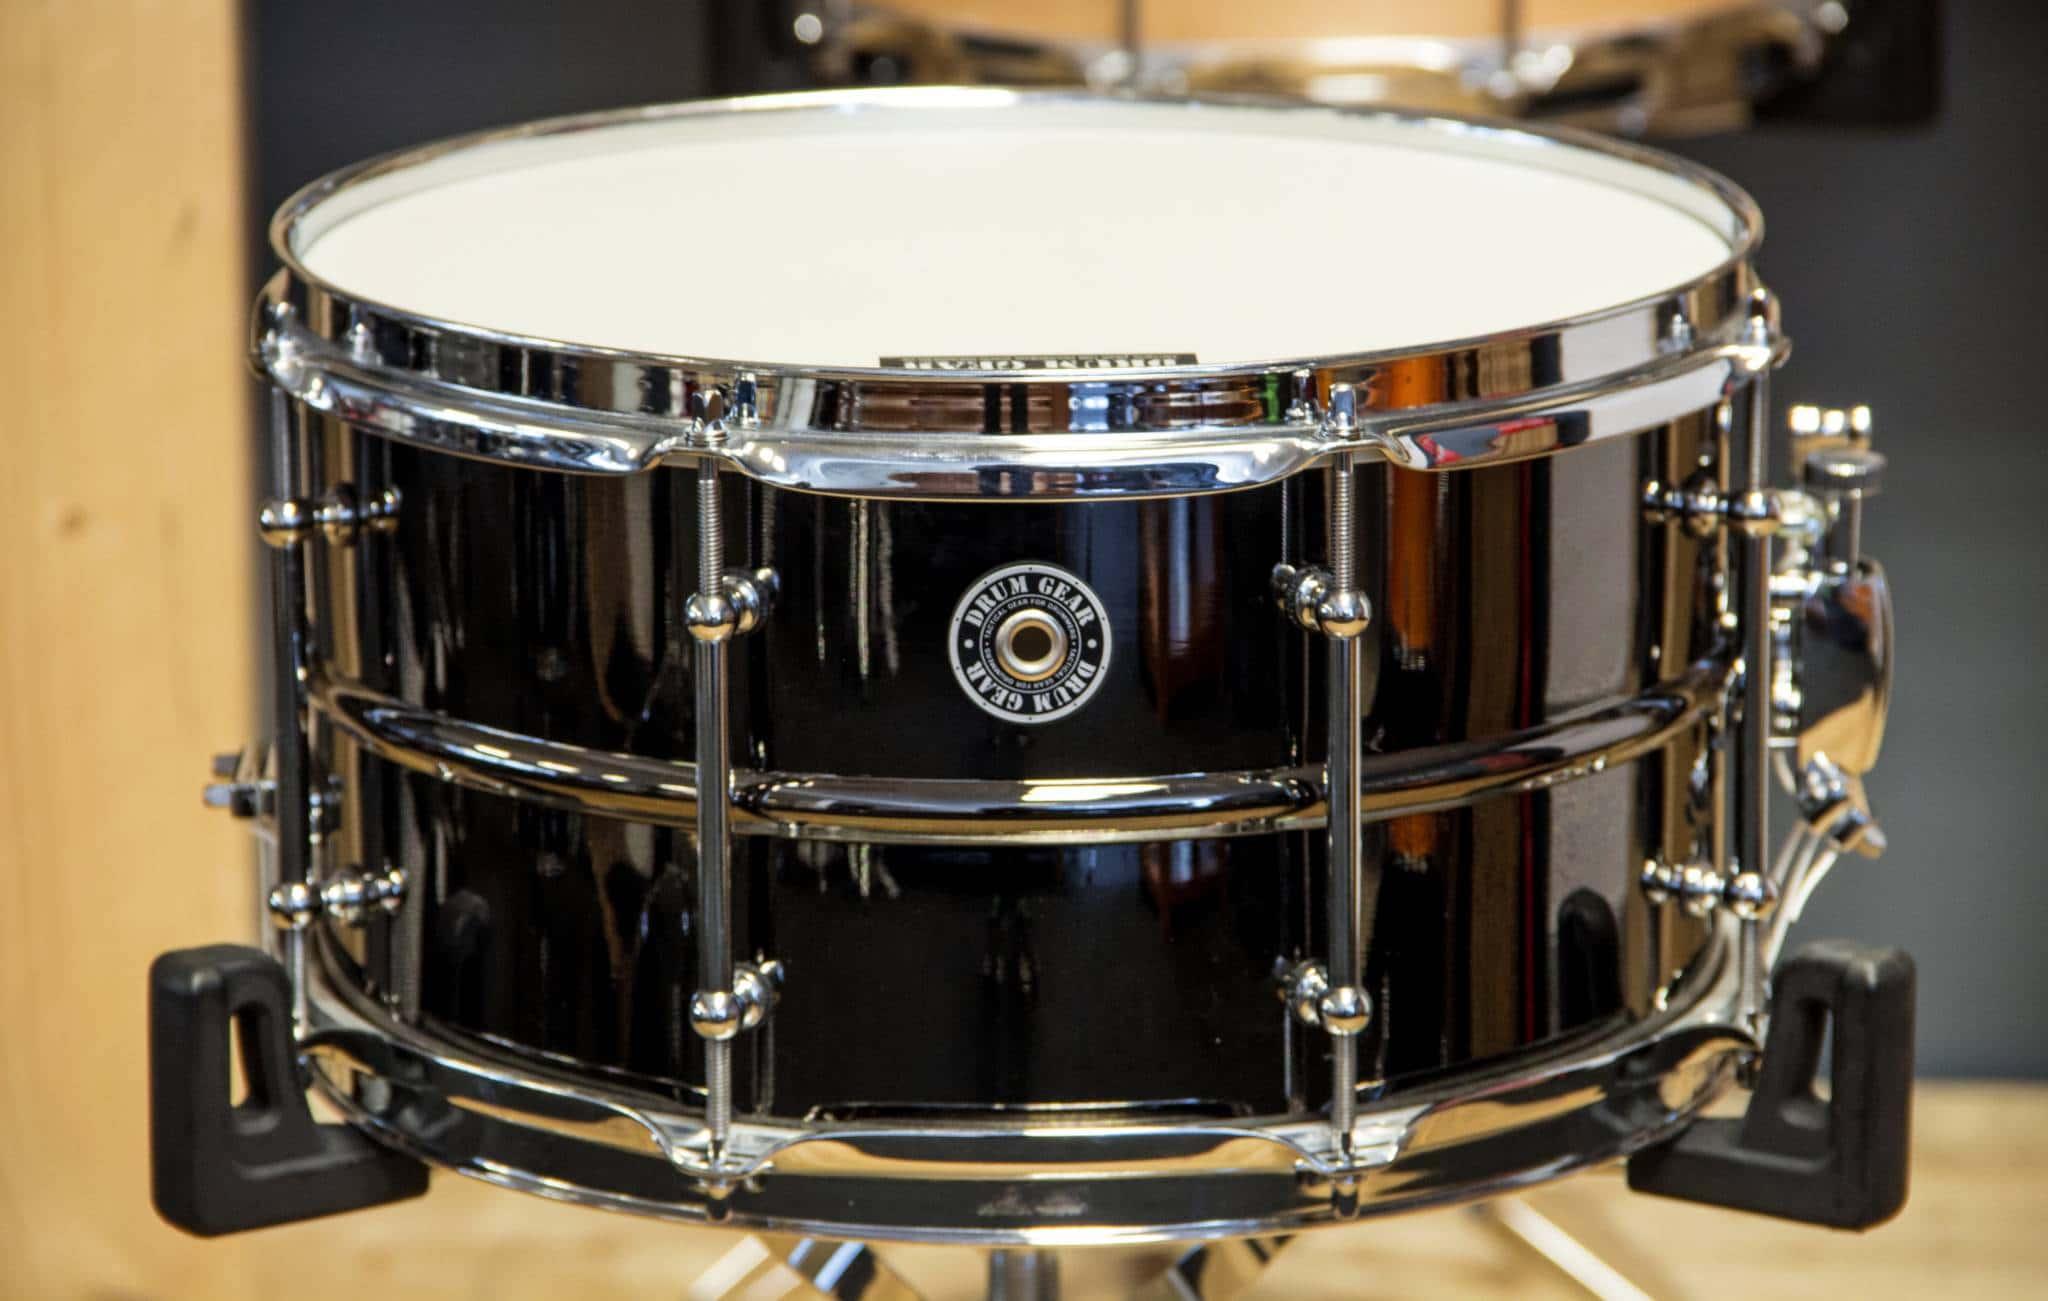 Drum Gear DGS B1370 SnareWorks MKII Brass snaredrum